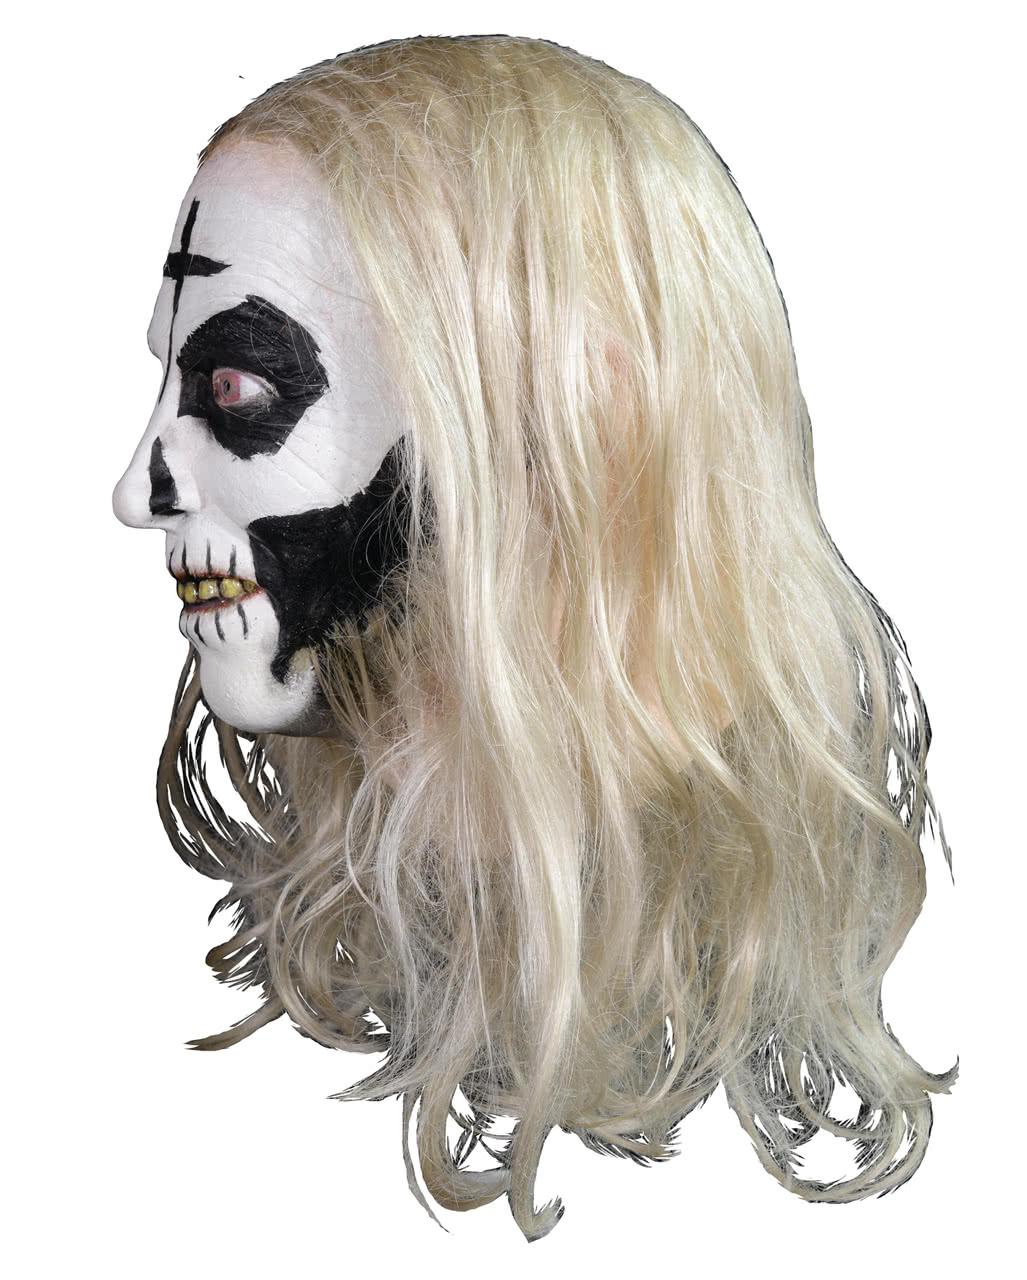 otis maske haus der 1000 leichen rob zombie maske. Black Bedroom Furniture Sets. Home Design Ideas